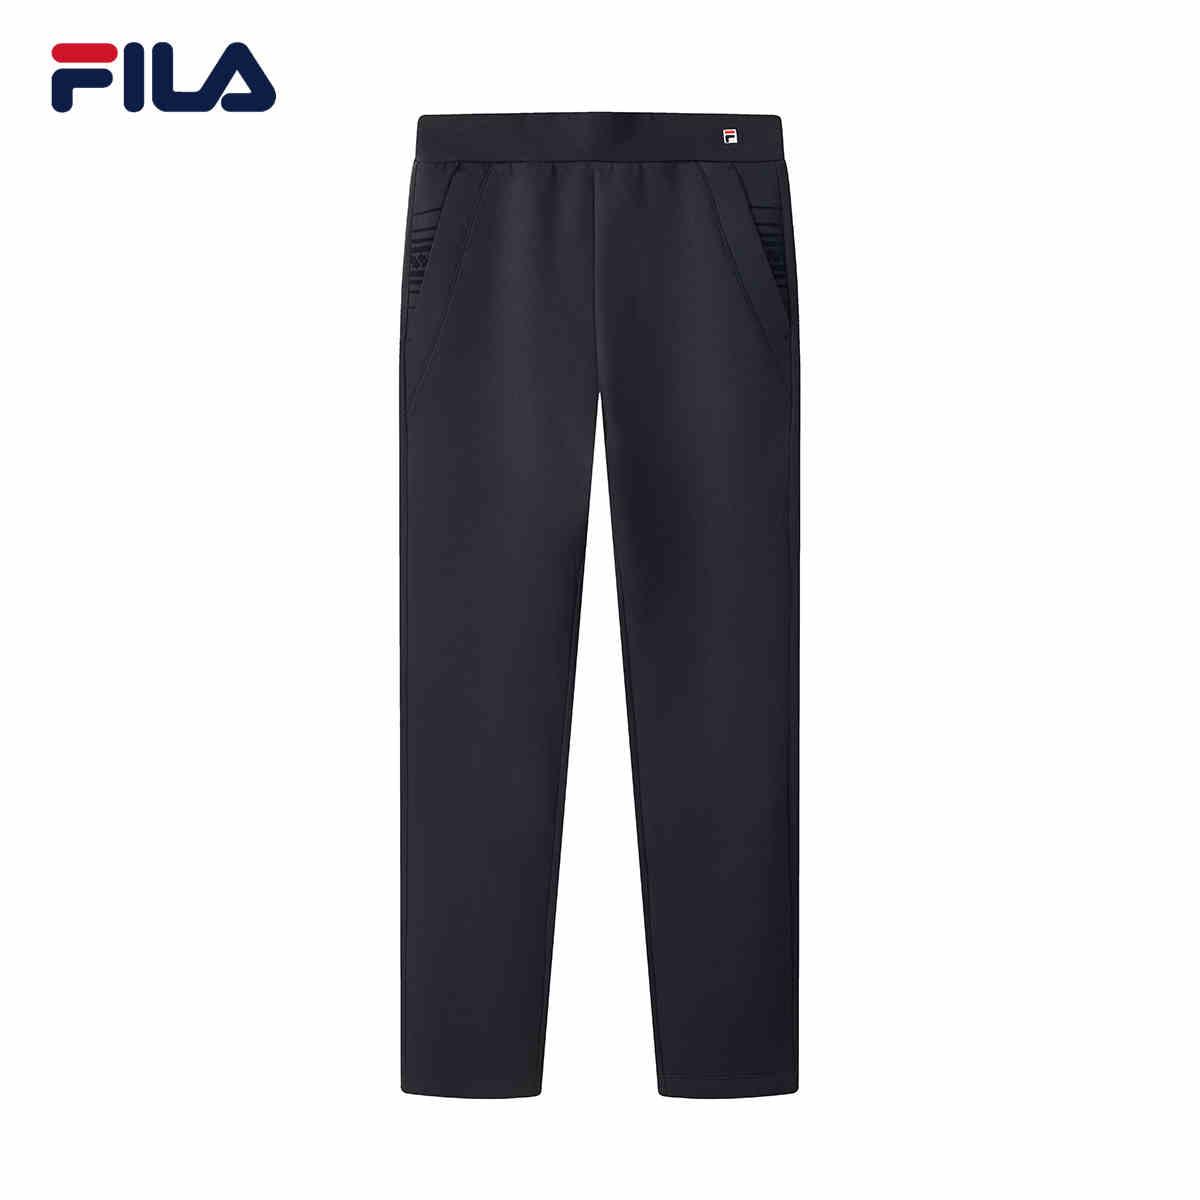 FILA/斐乐2020秋冬新款女装印花时尚运动长裤F11W041603F